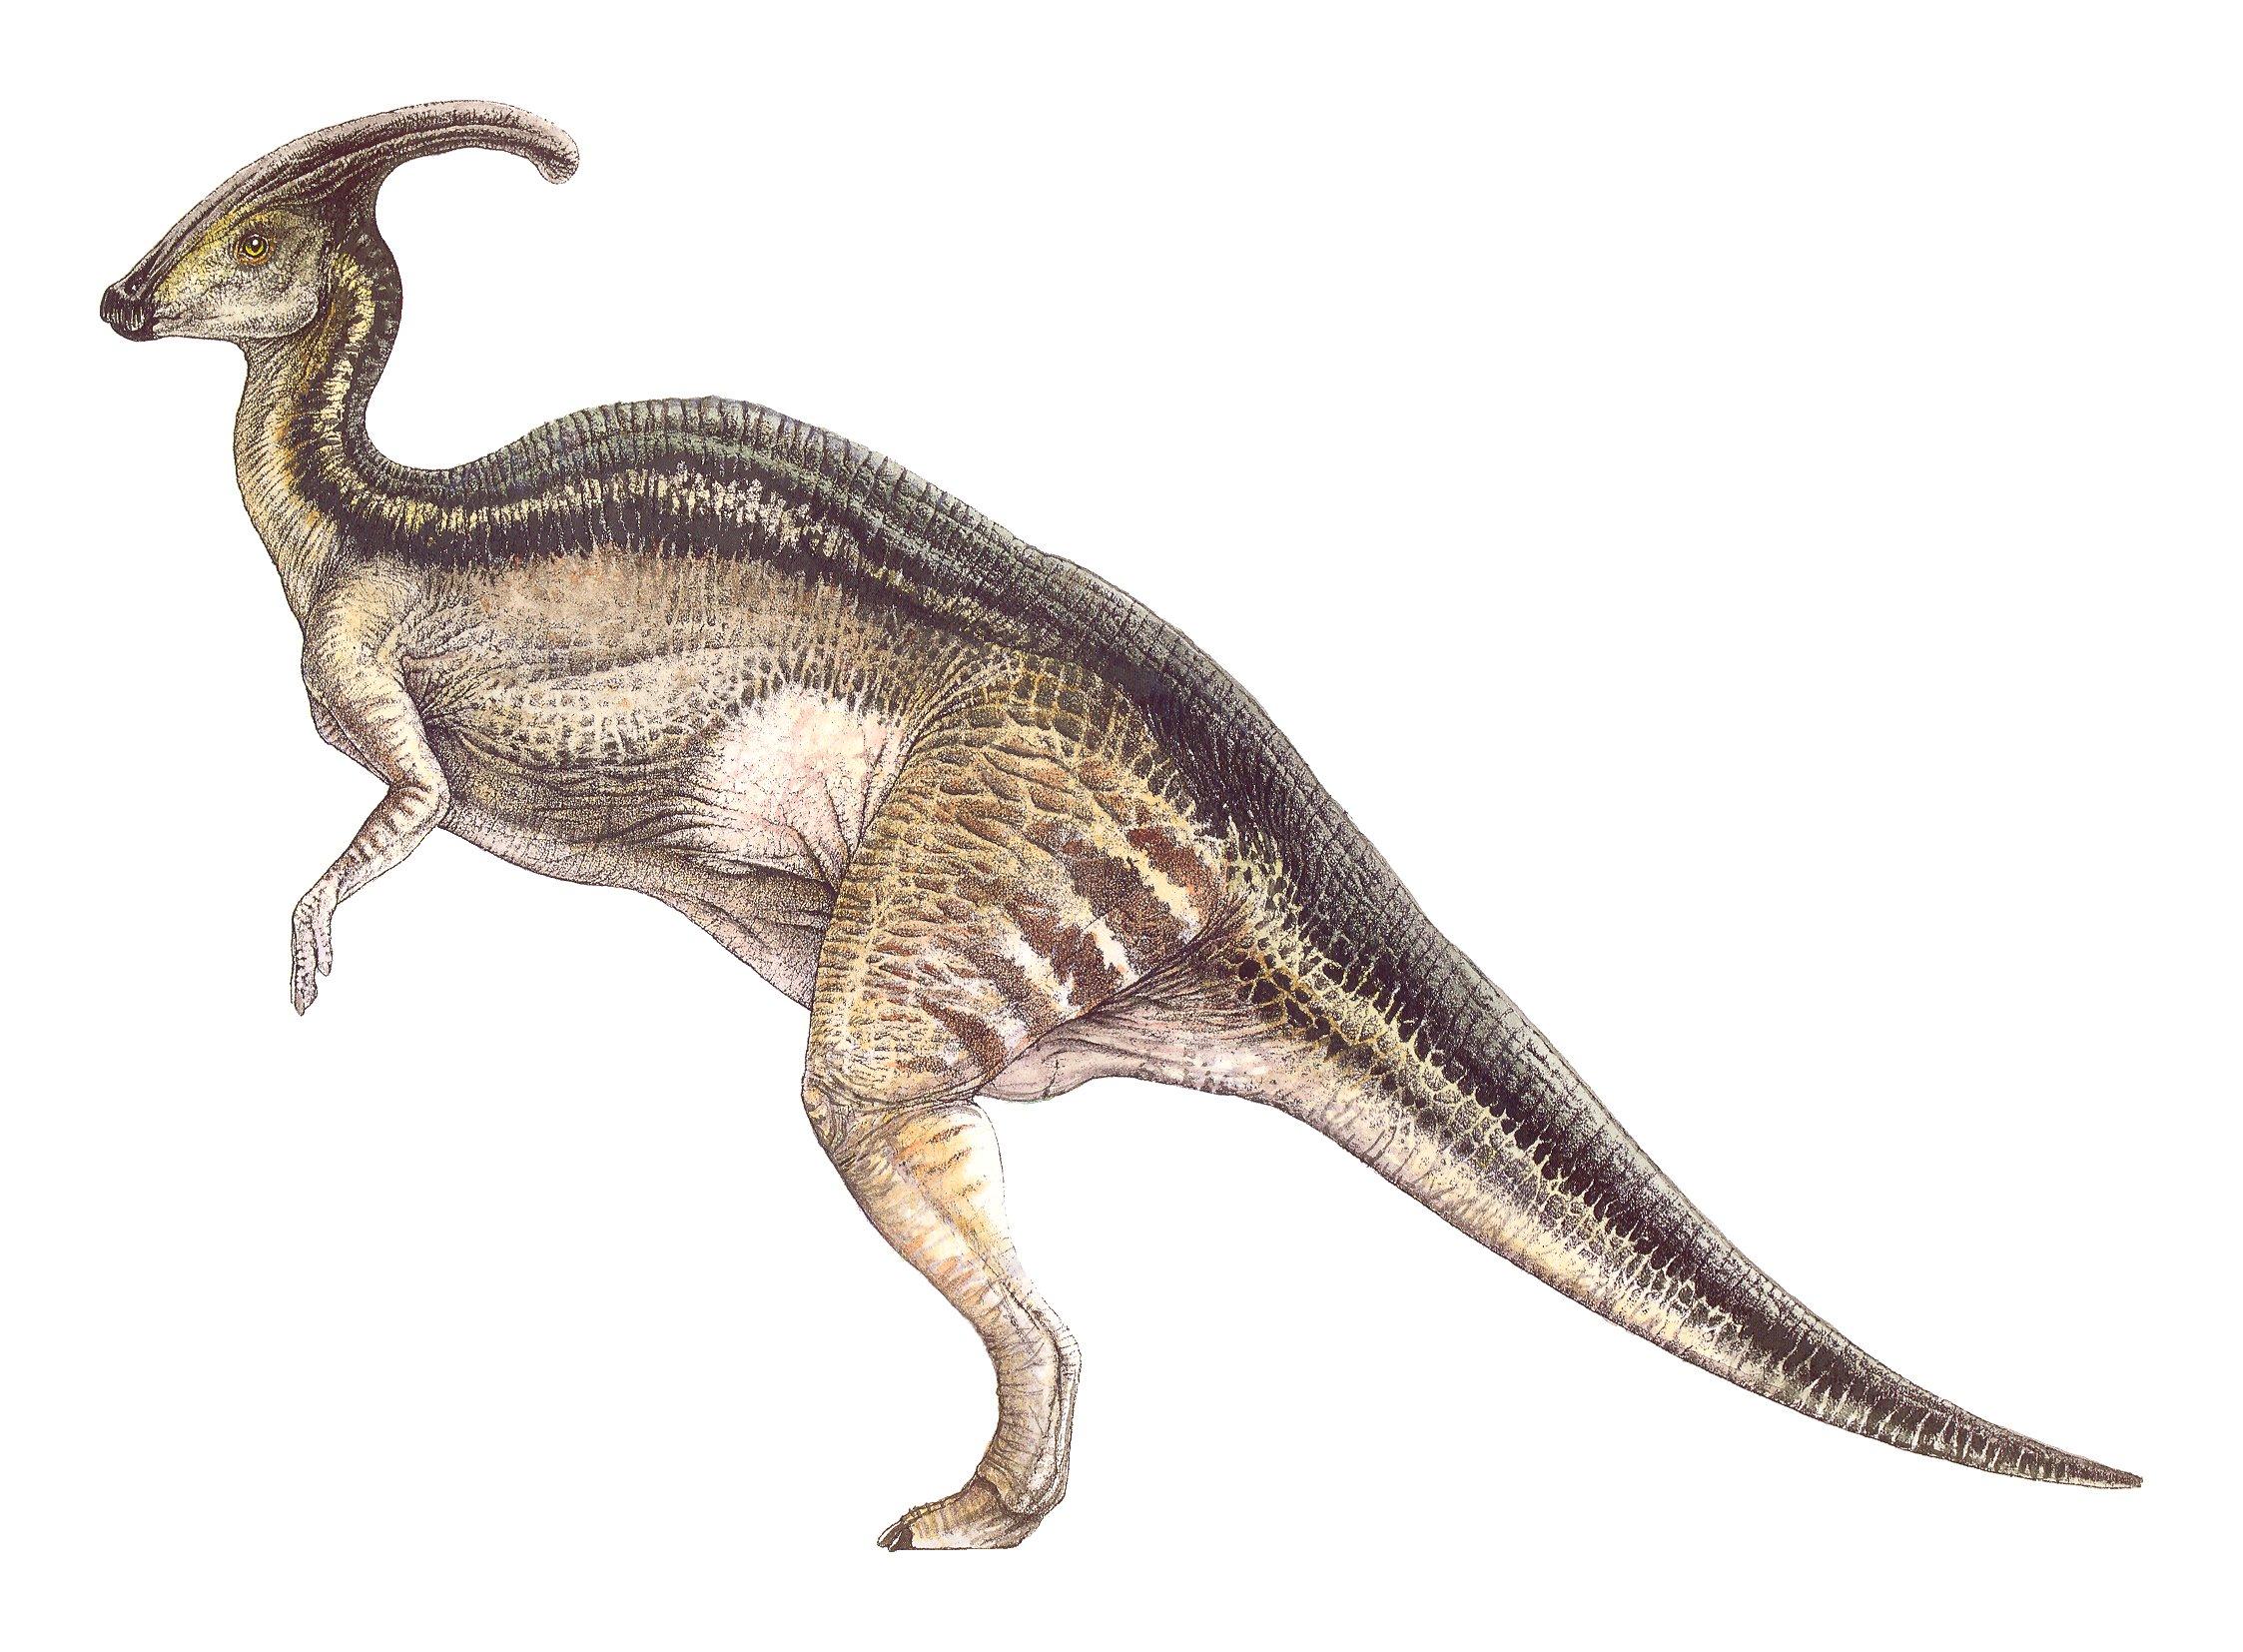 parasaurolophus - Jurassic Park Photo (38425221) - Fanpop